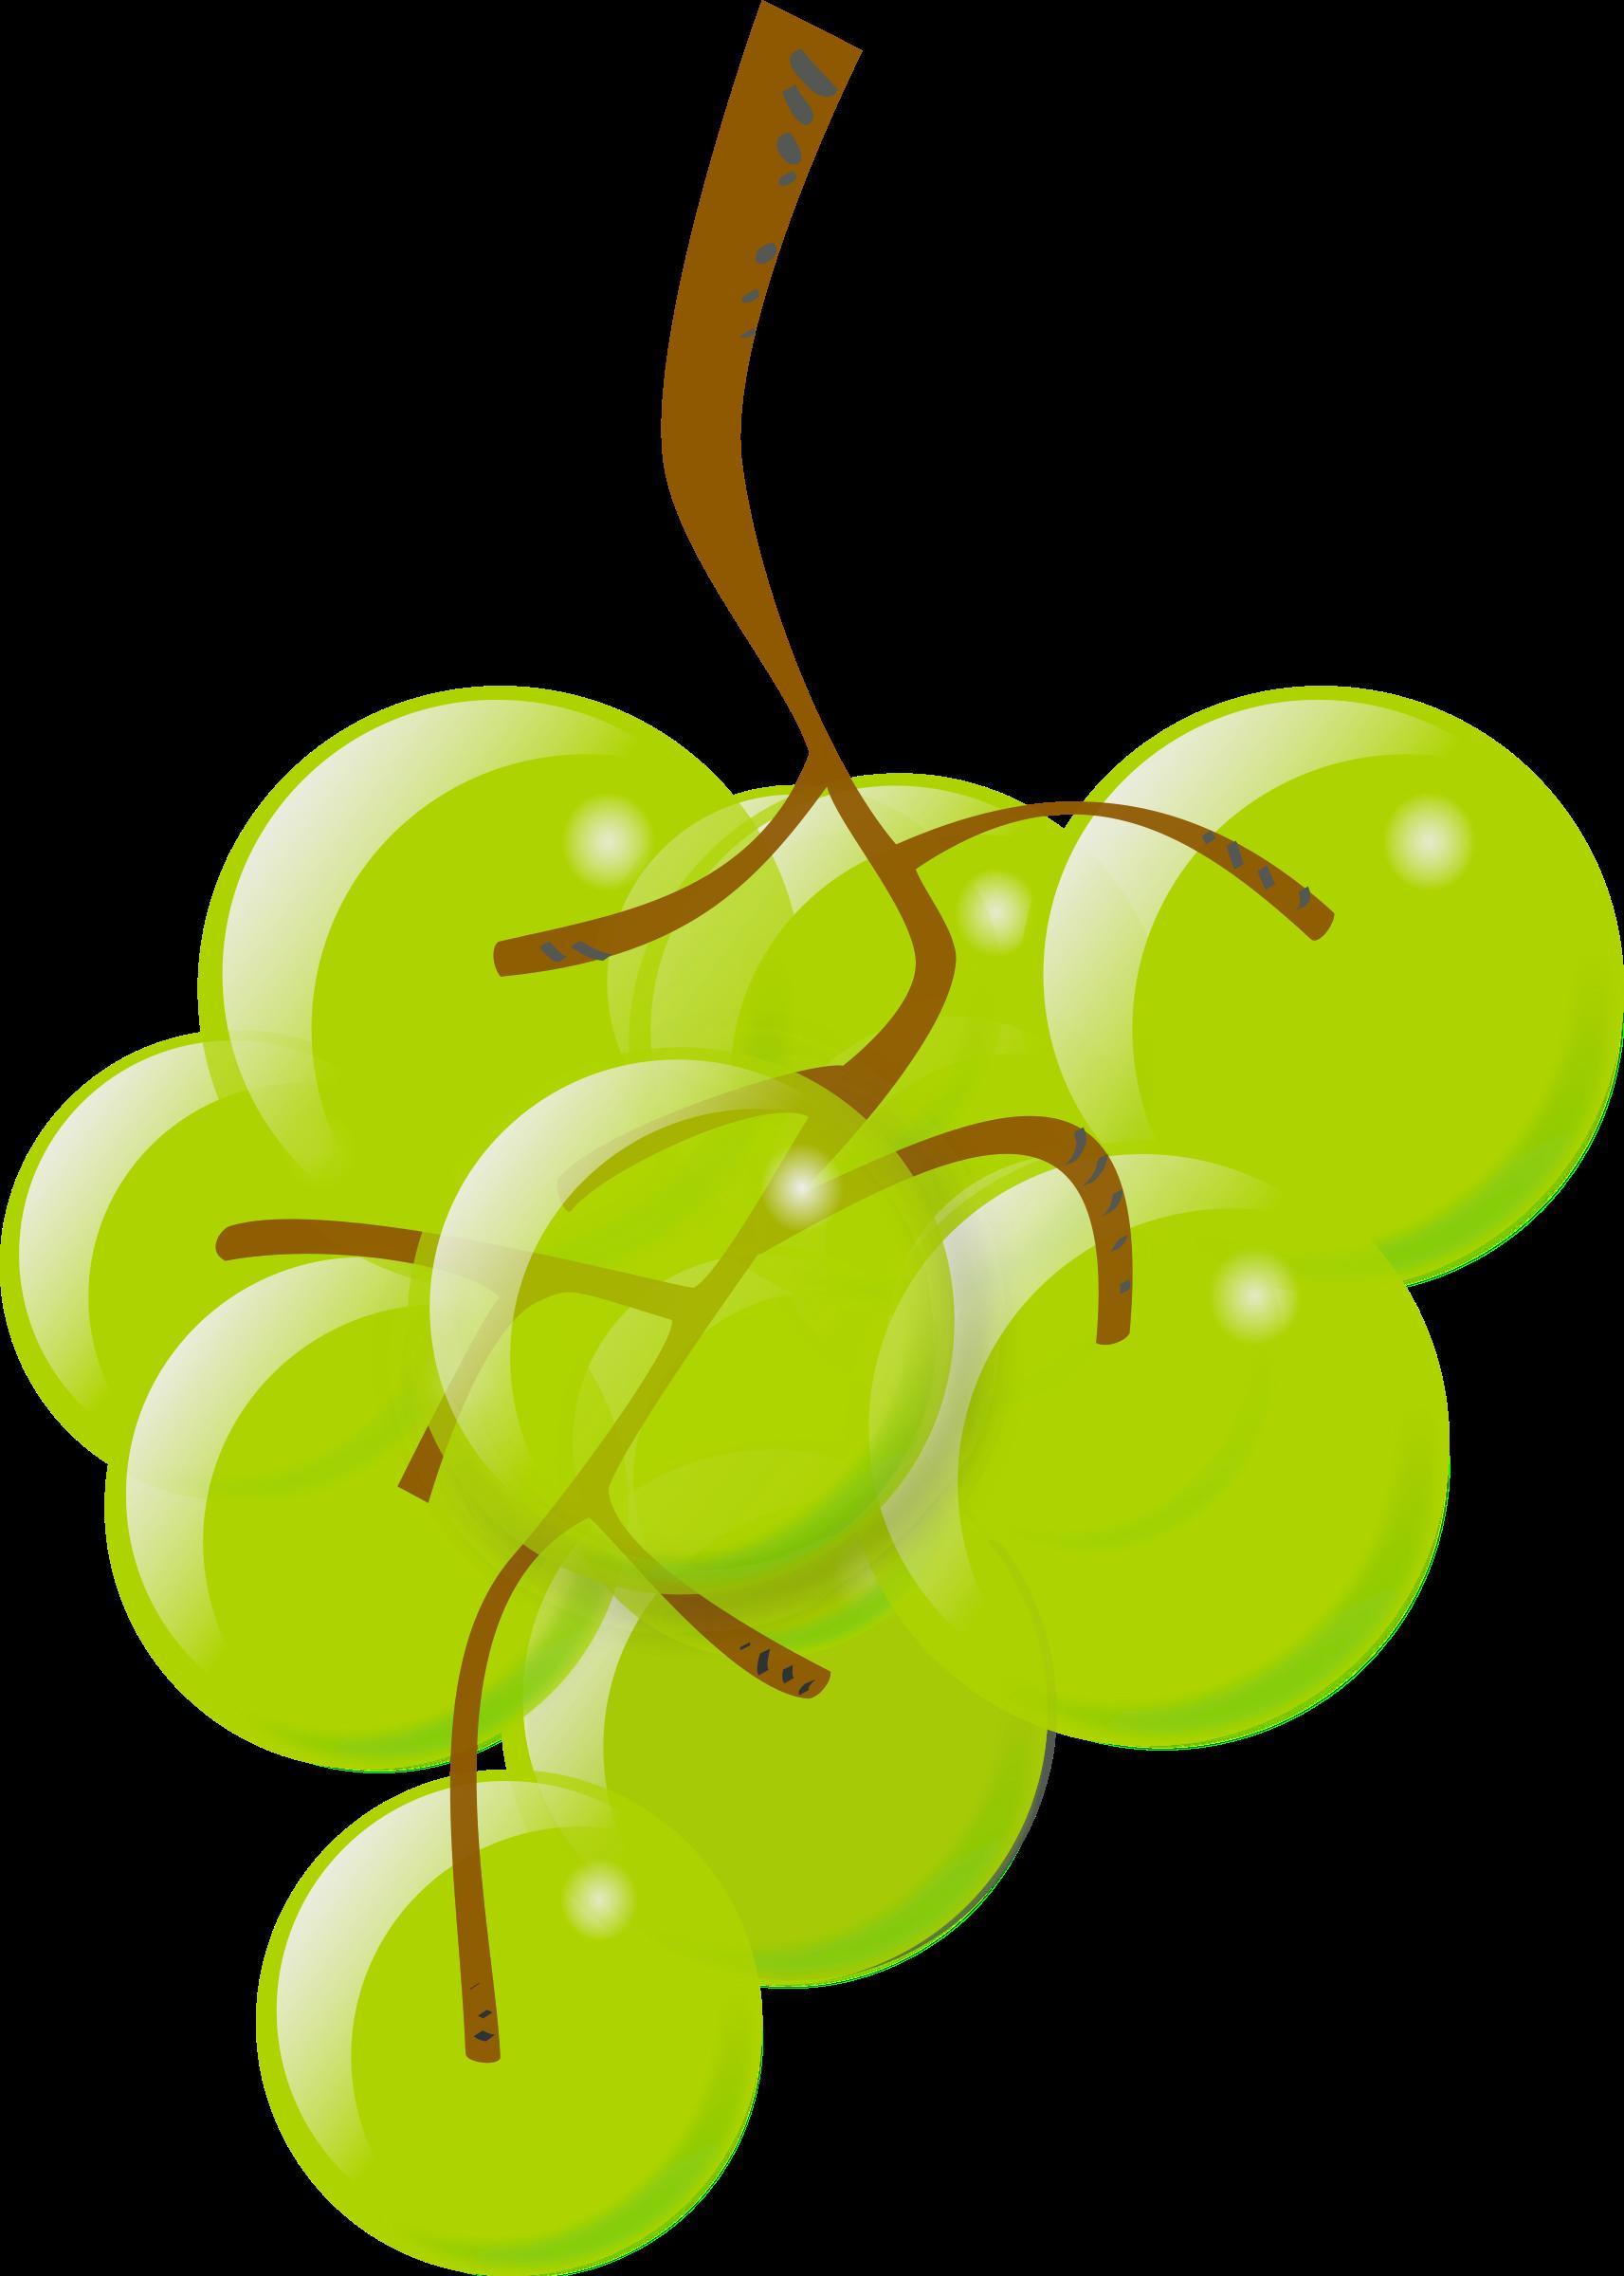 clip freeuse download Grape clipart illustration. Green grapes big image